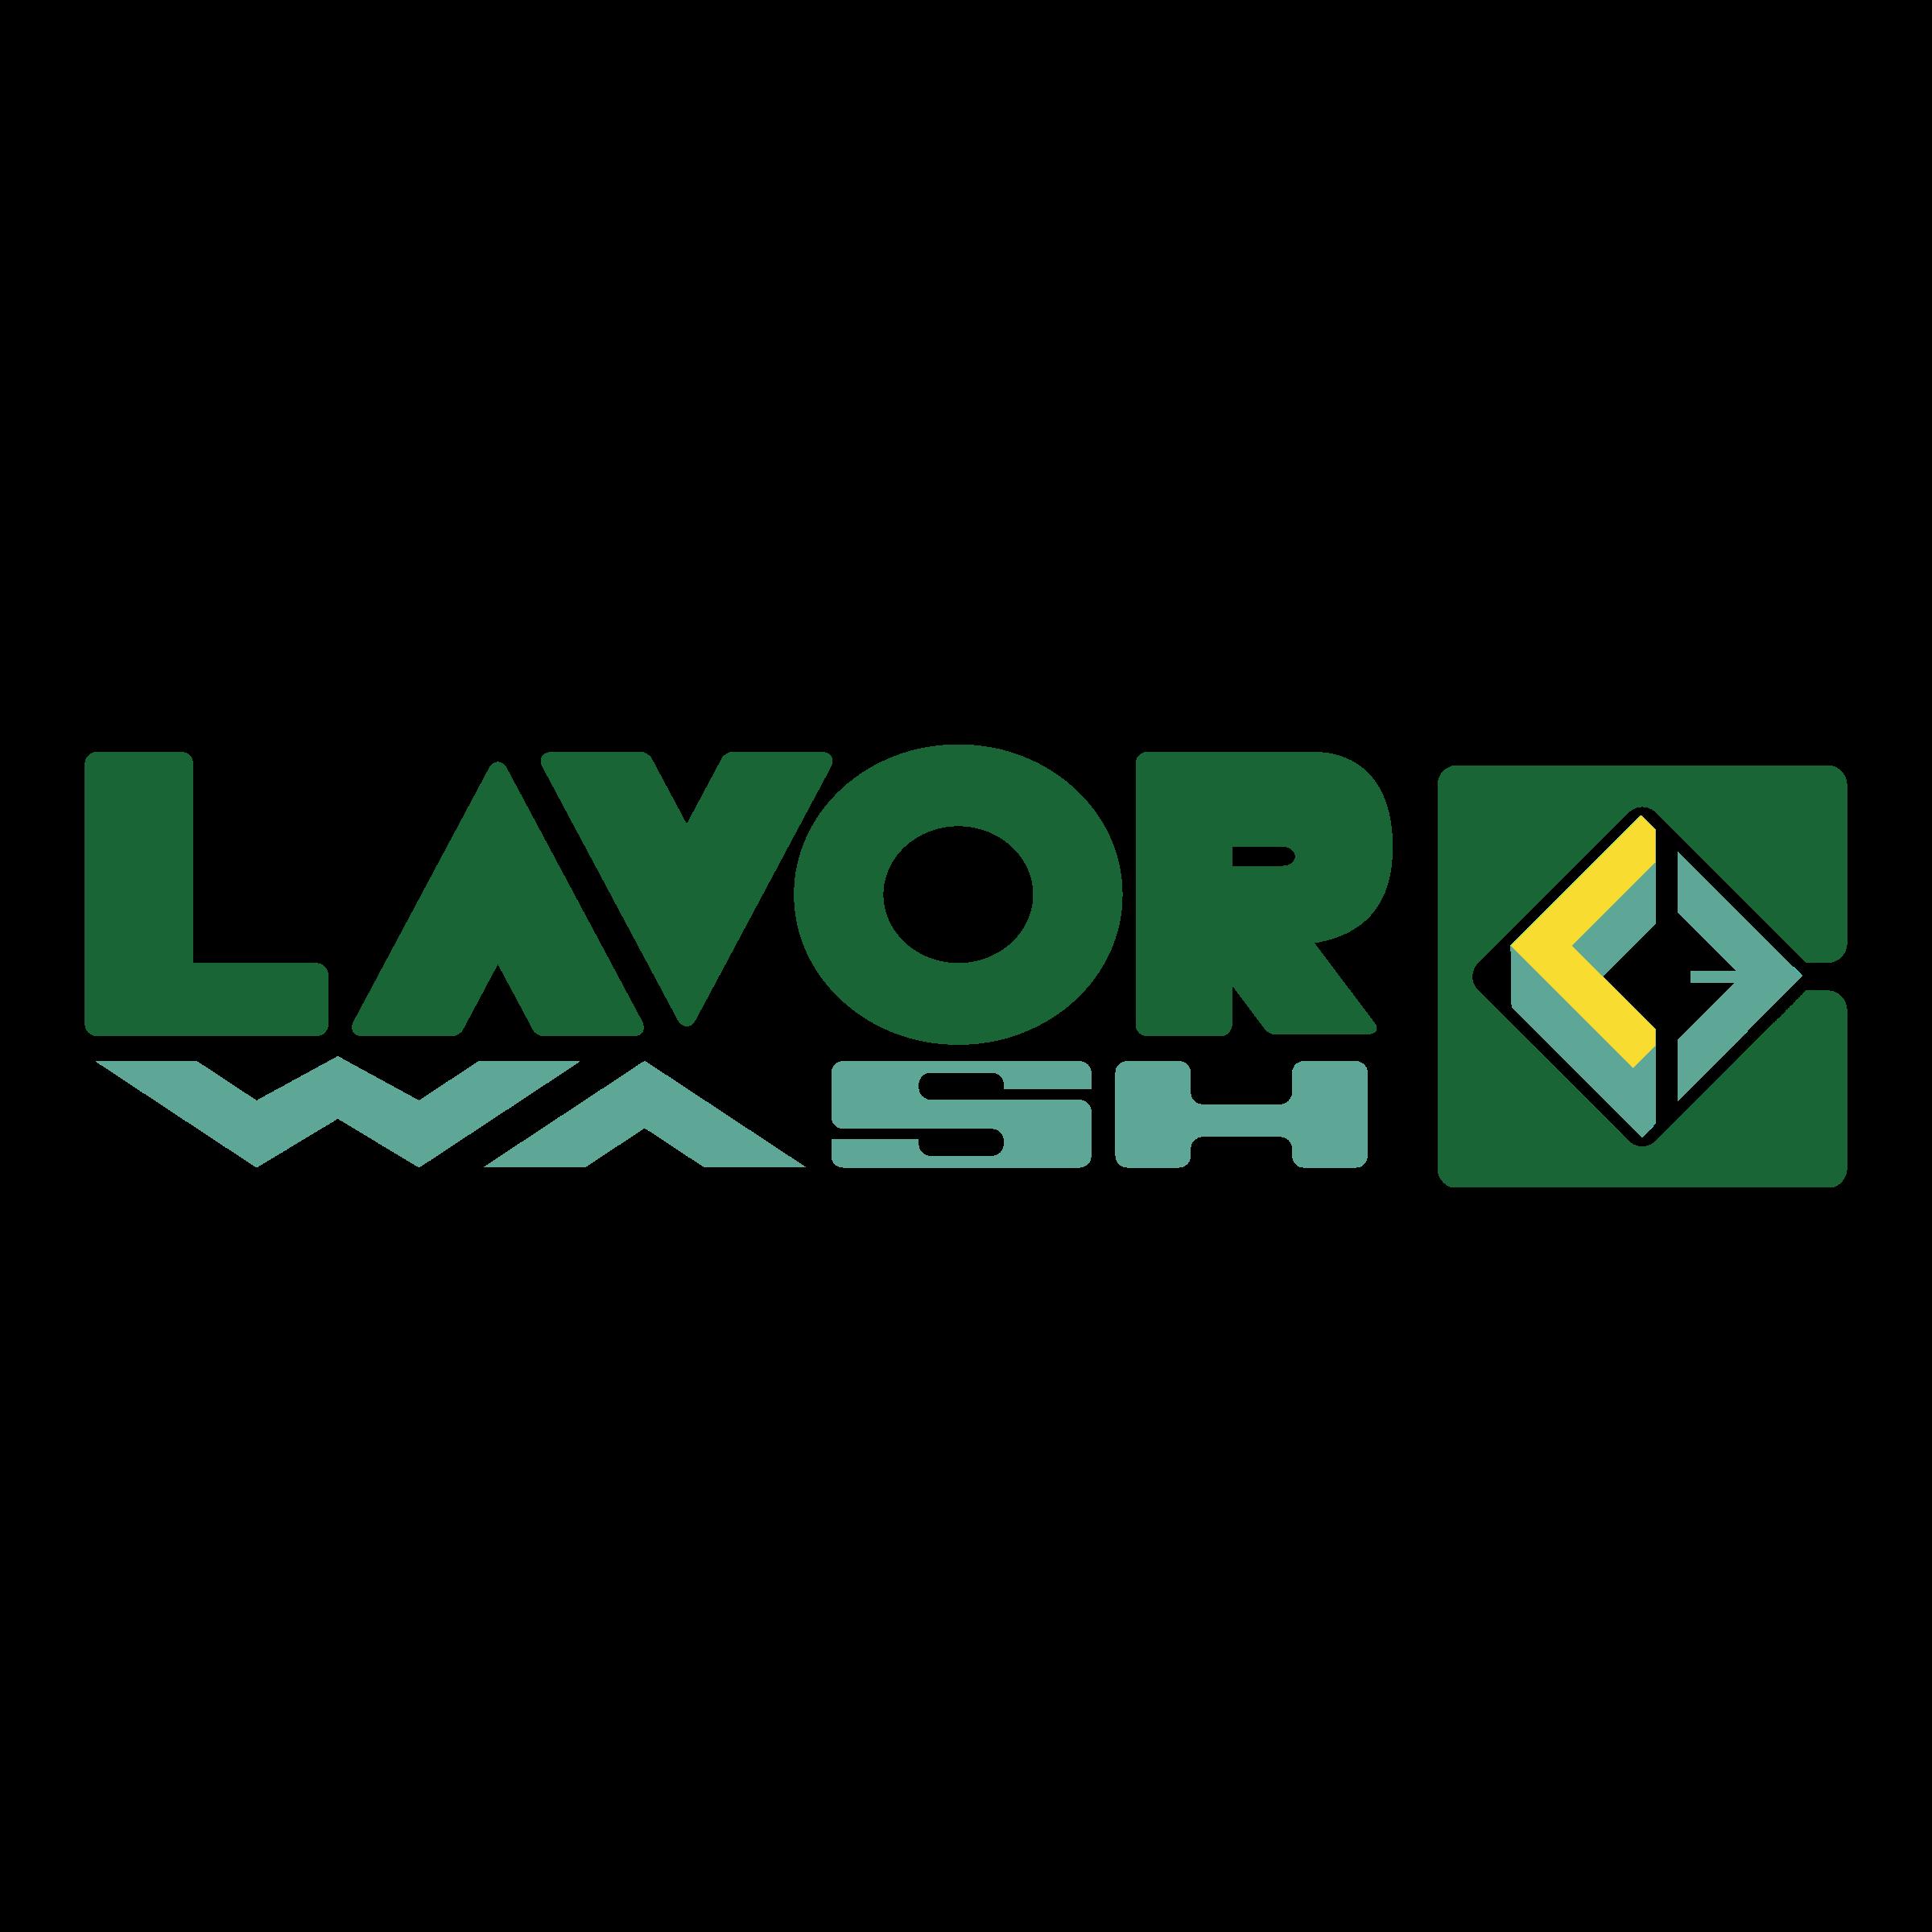 LAVOR LOGO